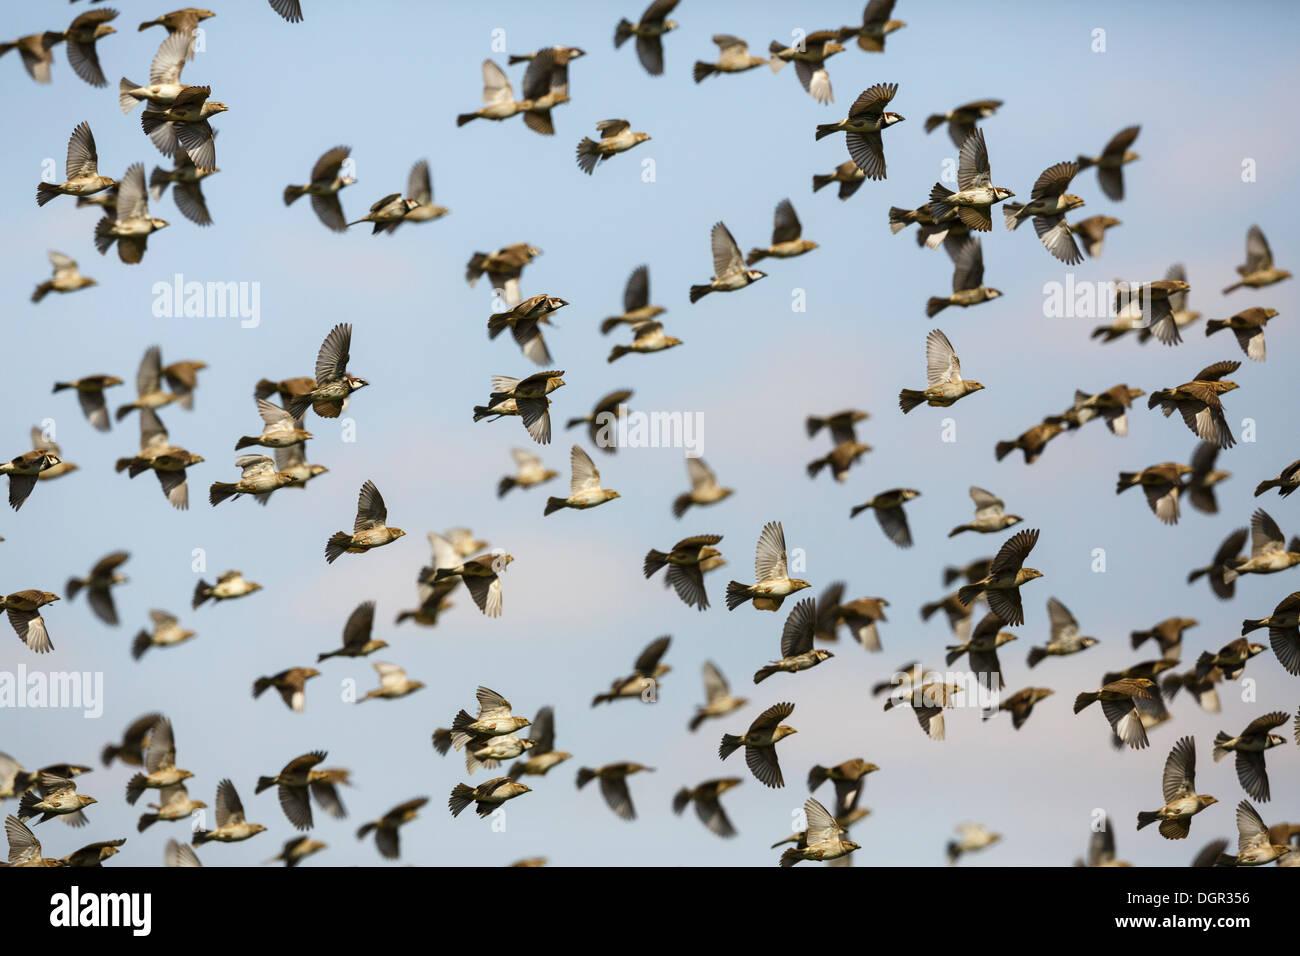 Spanish Sparrow - Passer hispaniolensis Stock Photo